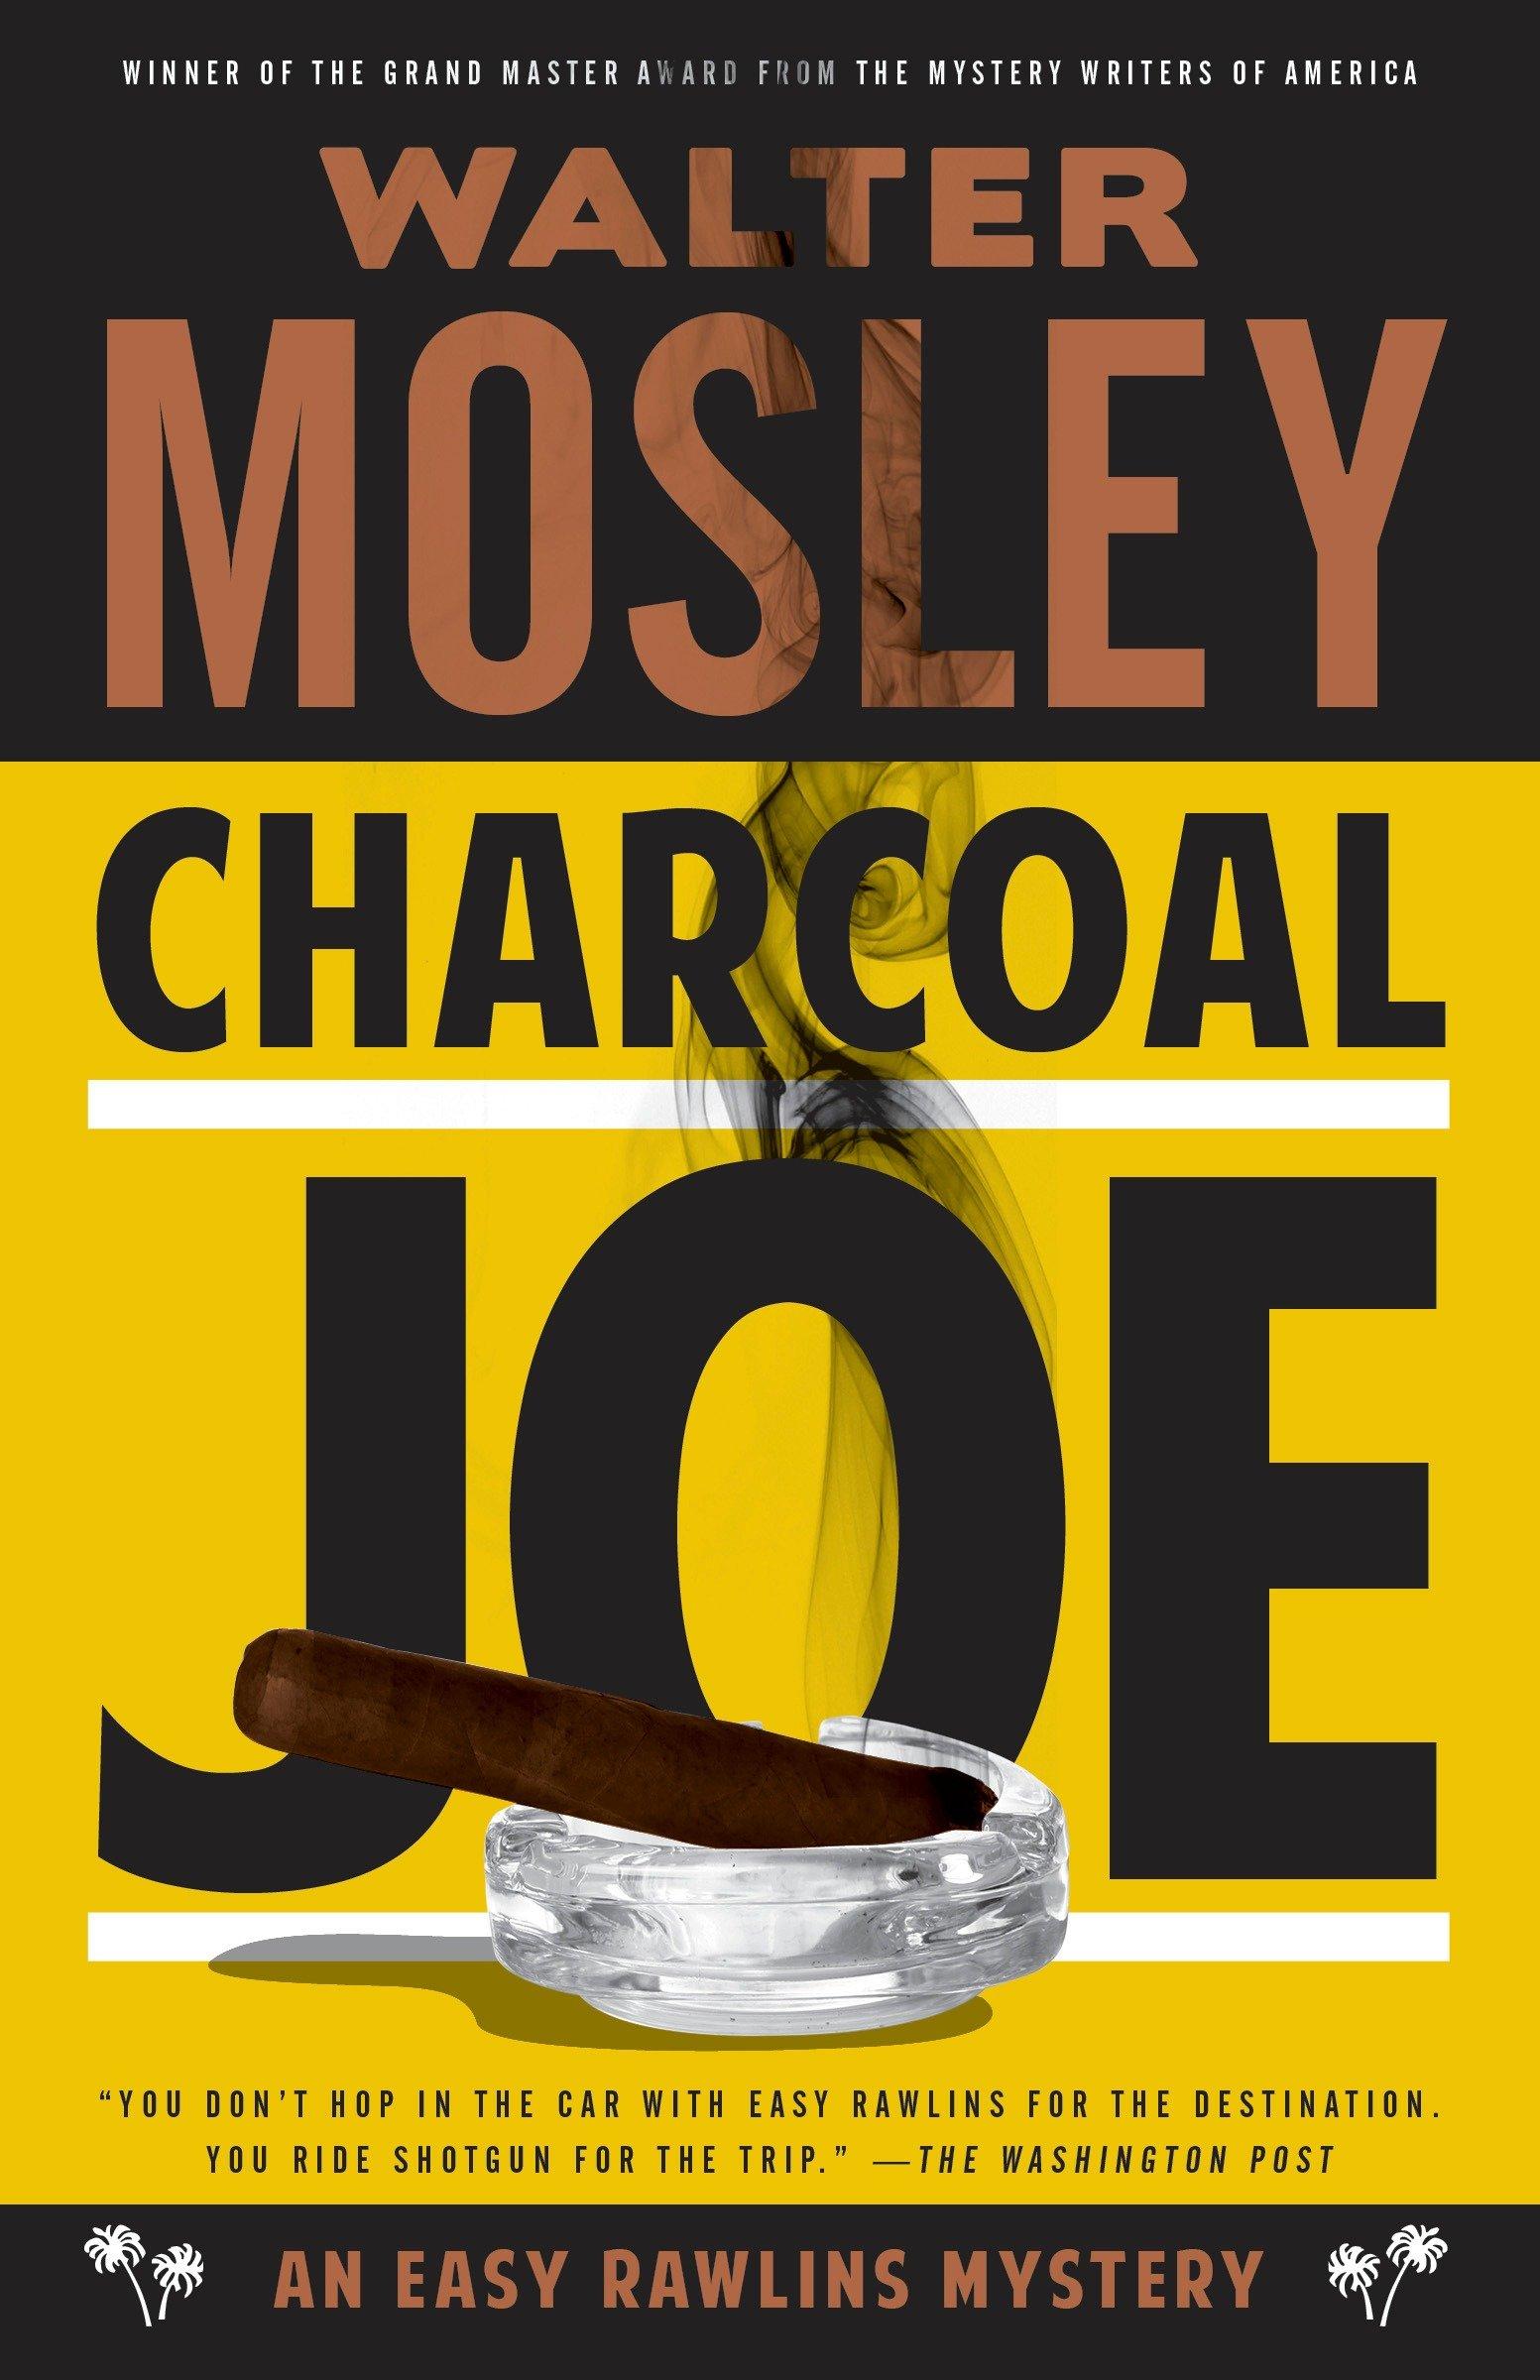 Charcoal Joe an Easy Rawlins mystery cover image